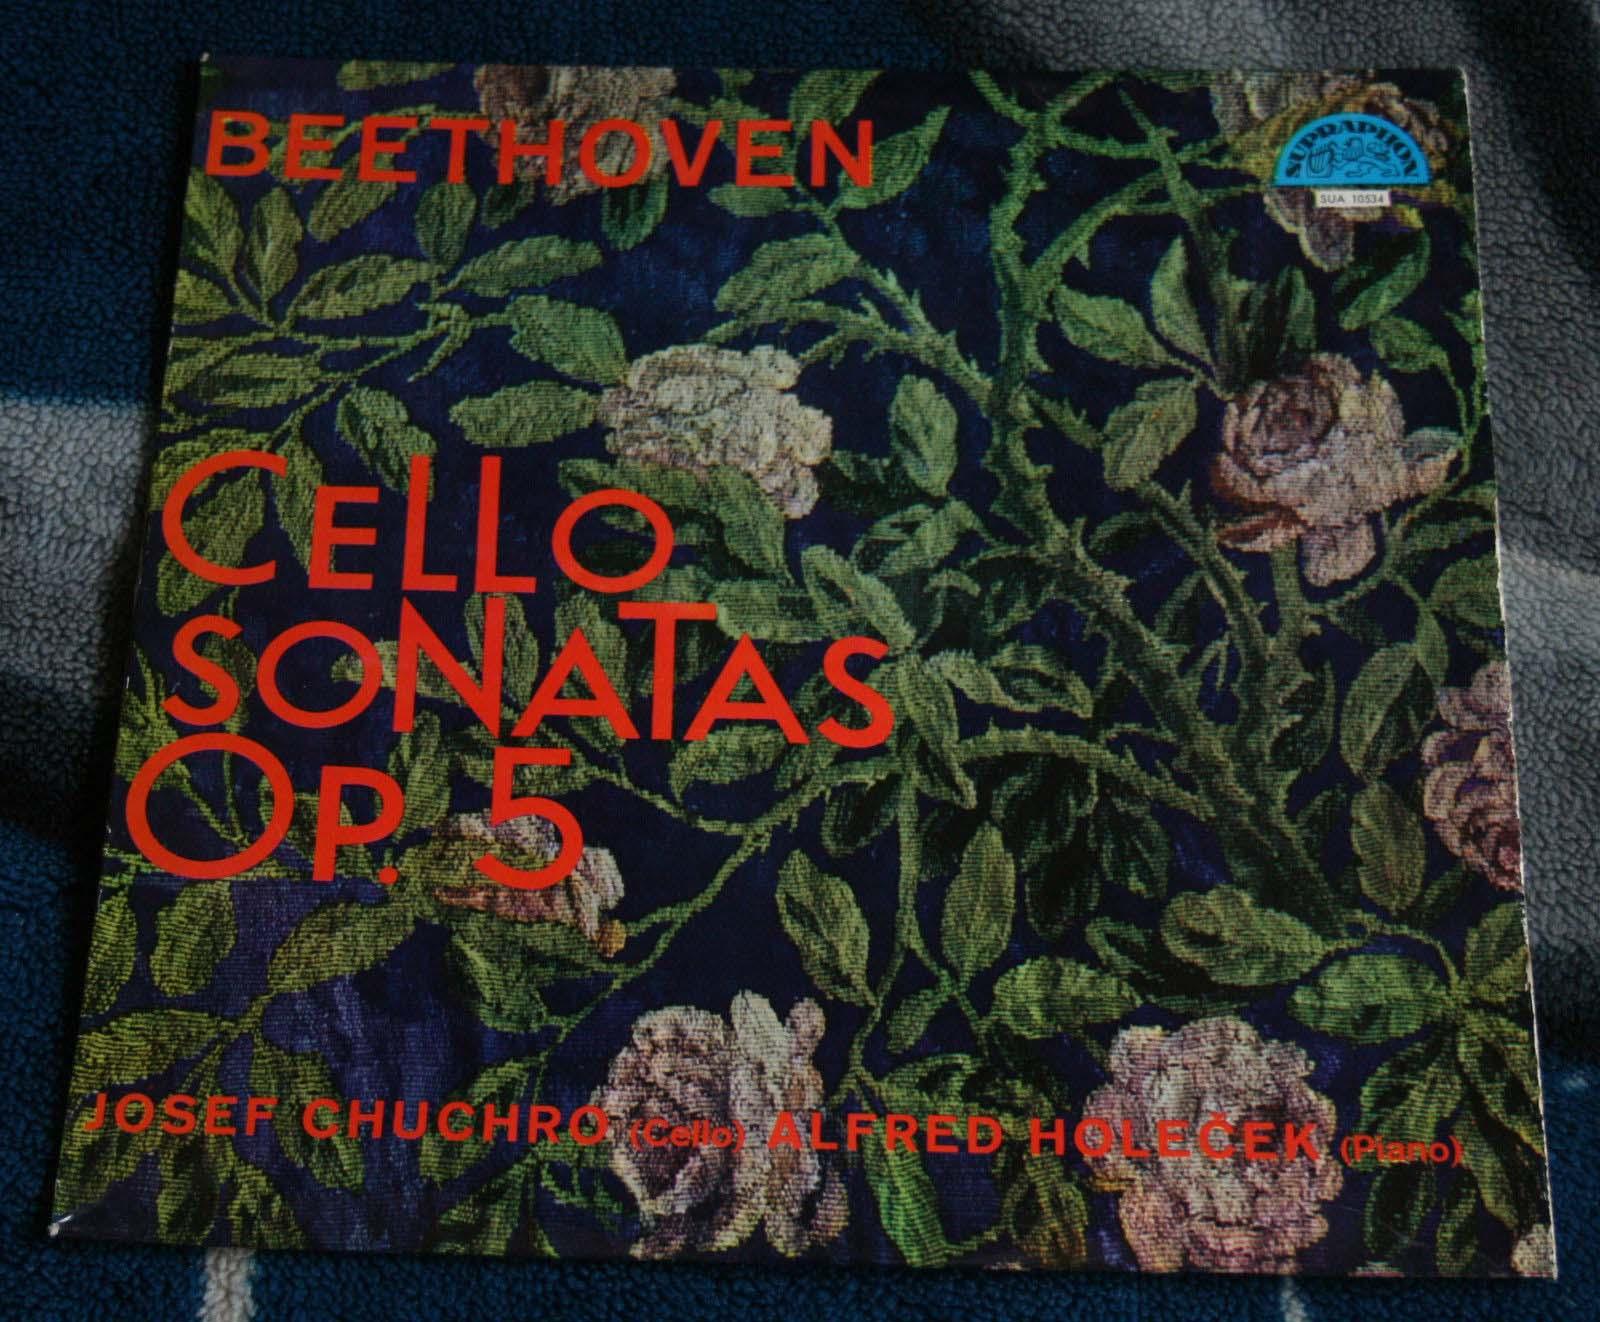 BEETHOVEN - Josef Chuhro - Alfred Holecek - CELLO SONATAS OP. 5